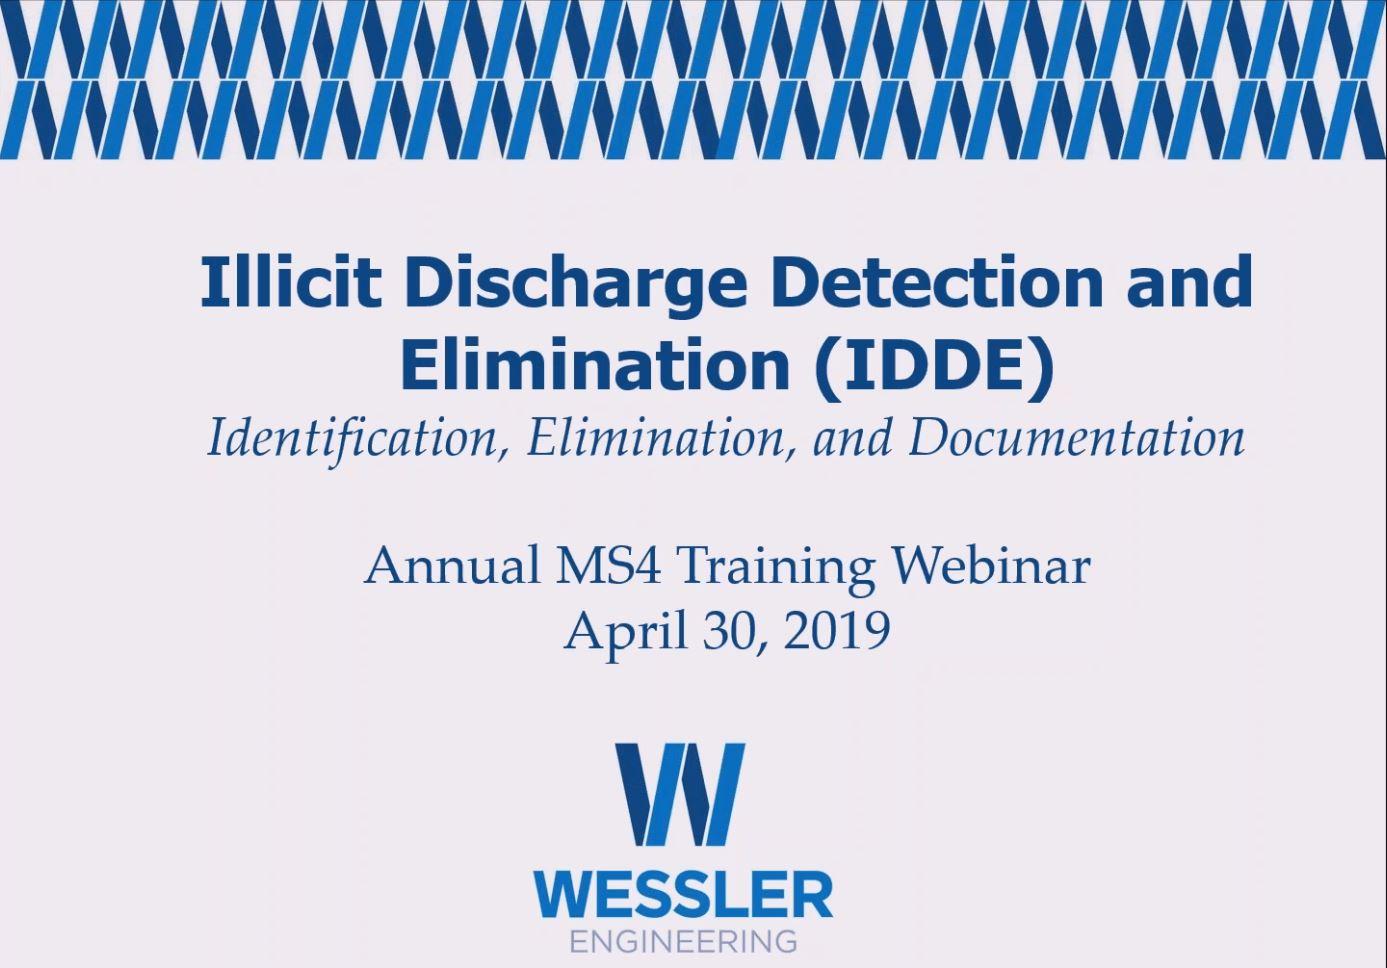 [Webinar Recording] Illicit Discharge Detection and Elimination